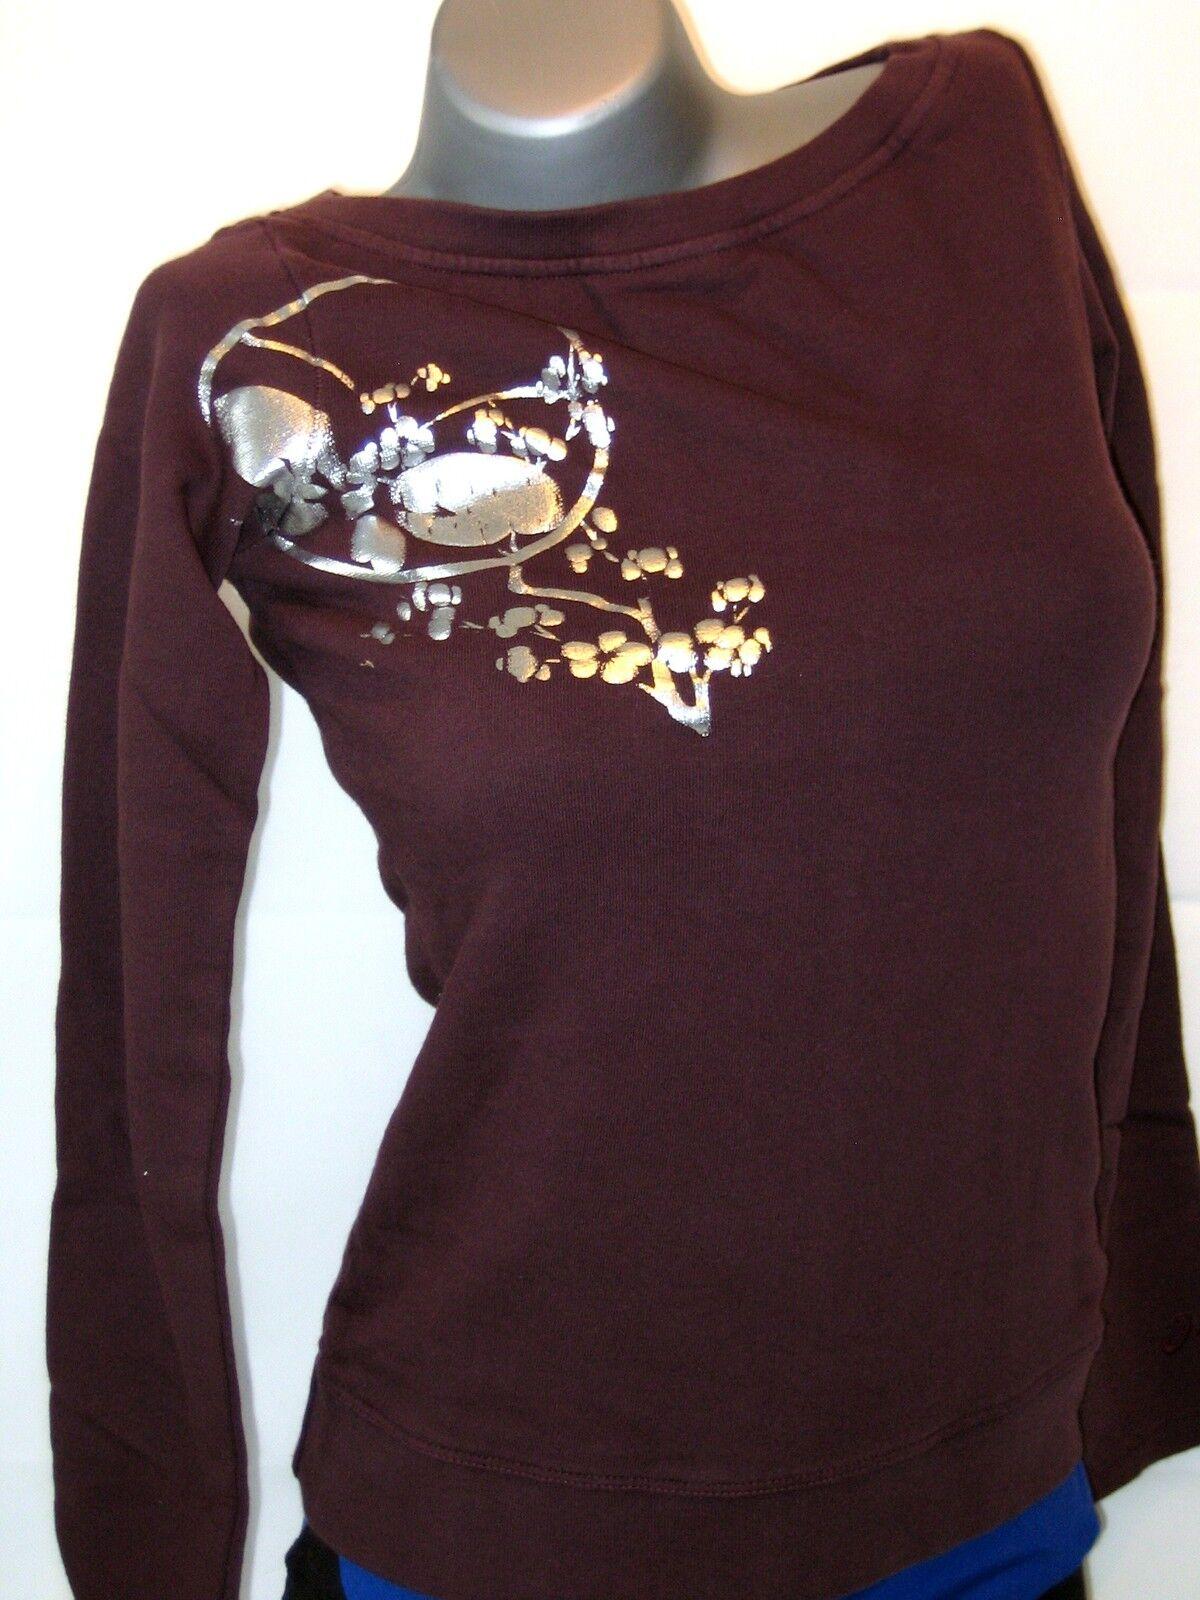 ASICS Women's Sweatshirt Size S Brown NEW Idoru Sweatshirt